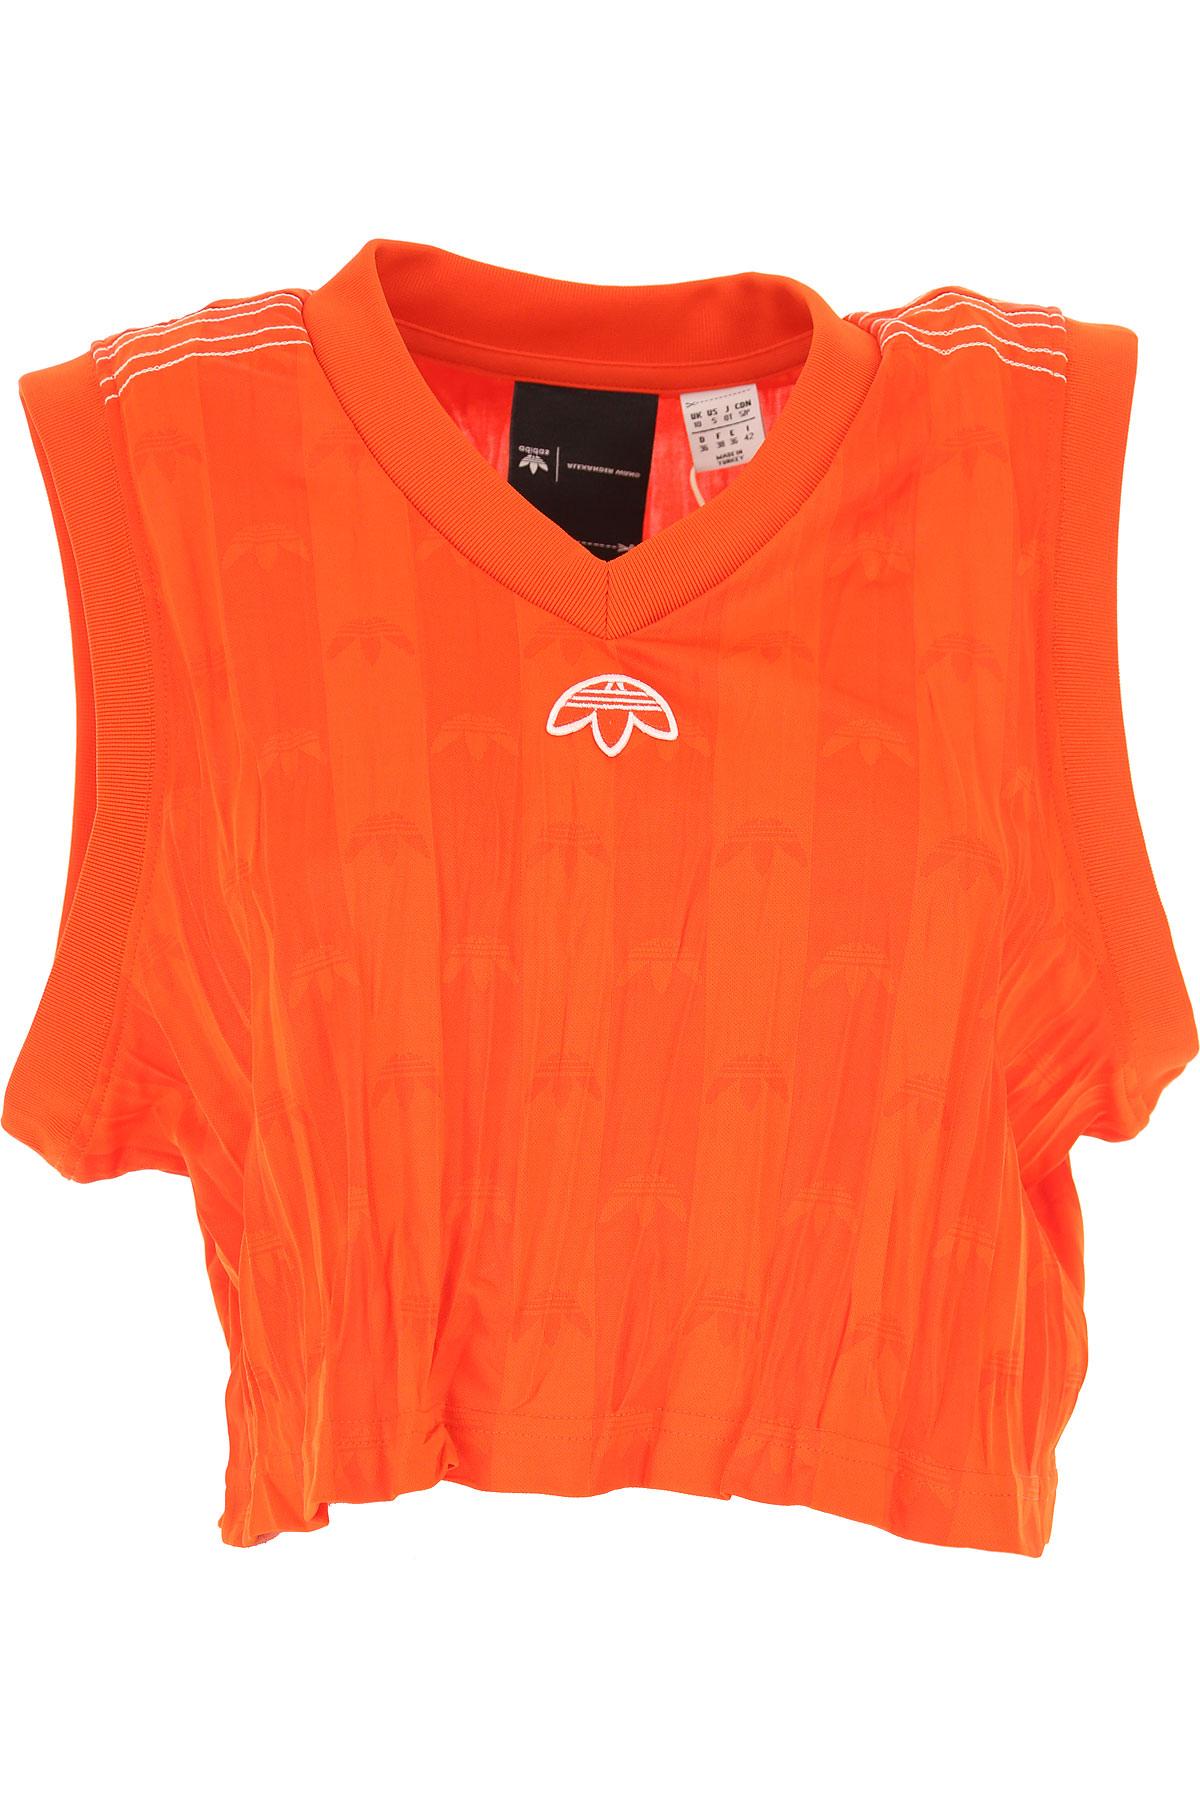 Image of Adidas T-Shirt for Women, Orange, polyestere, 2017, 10 6